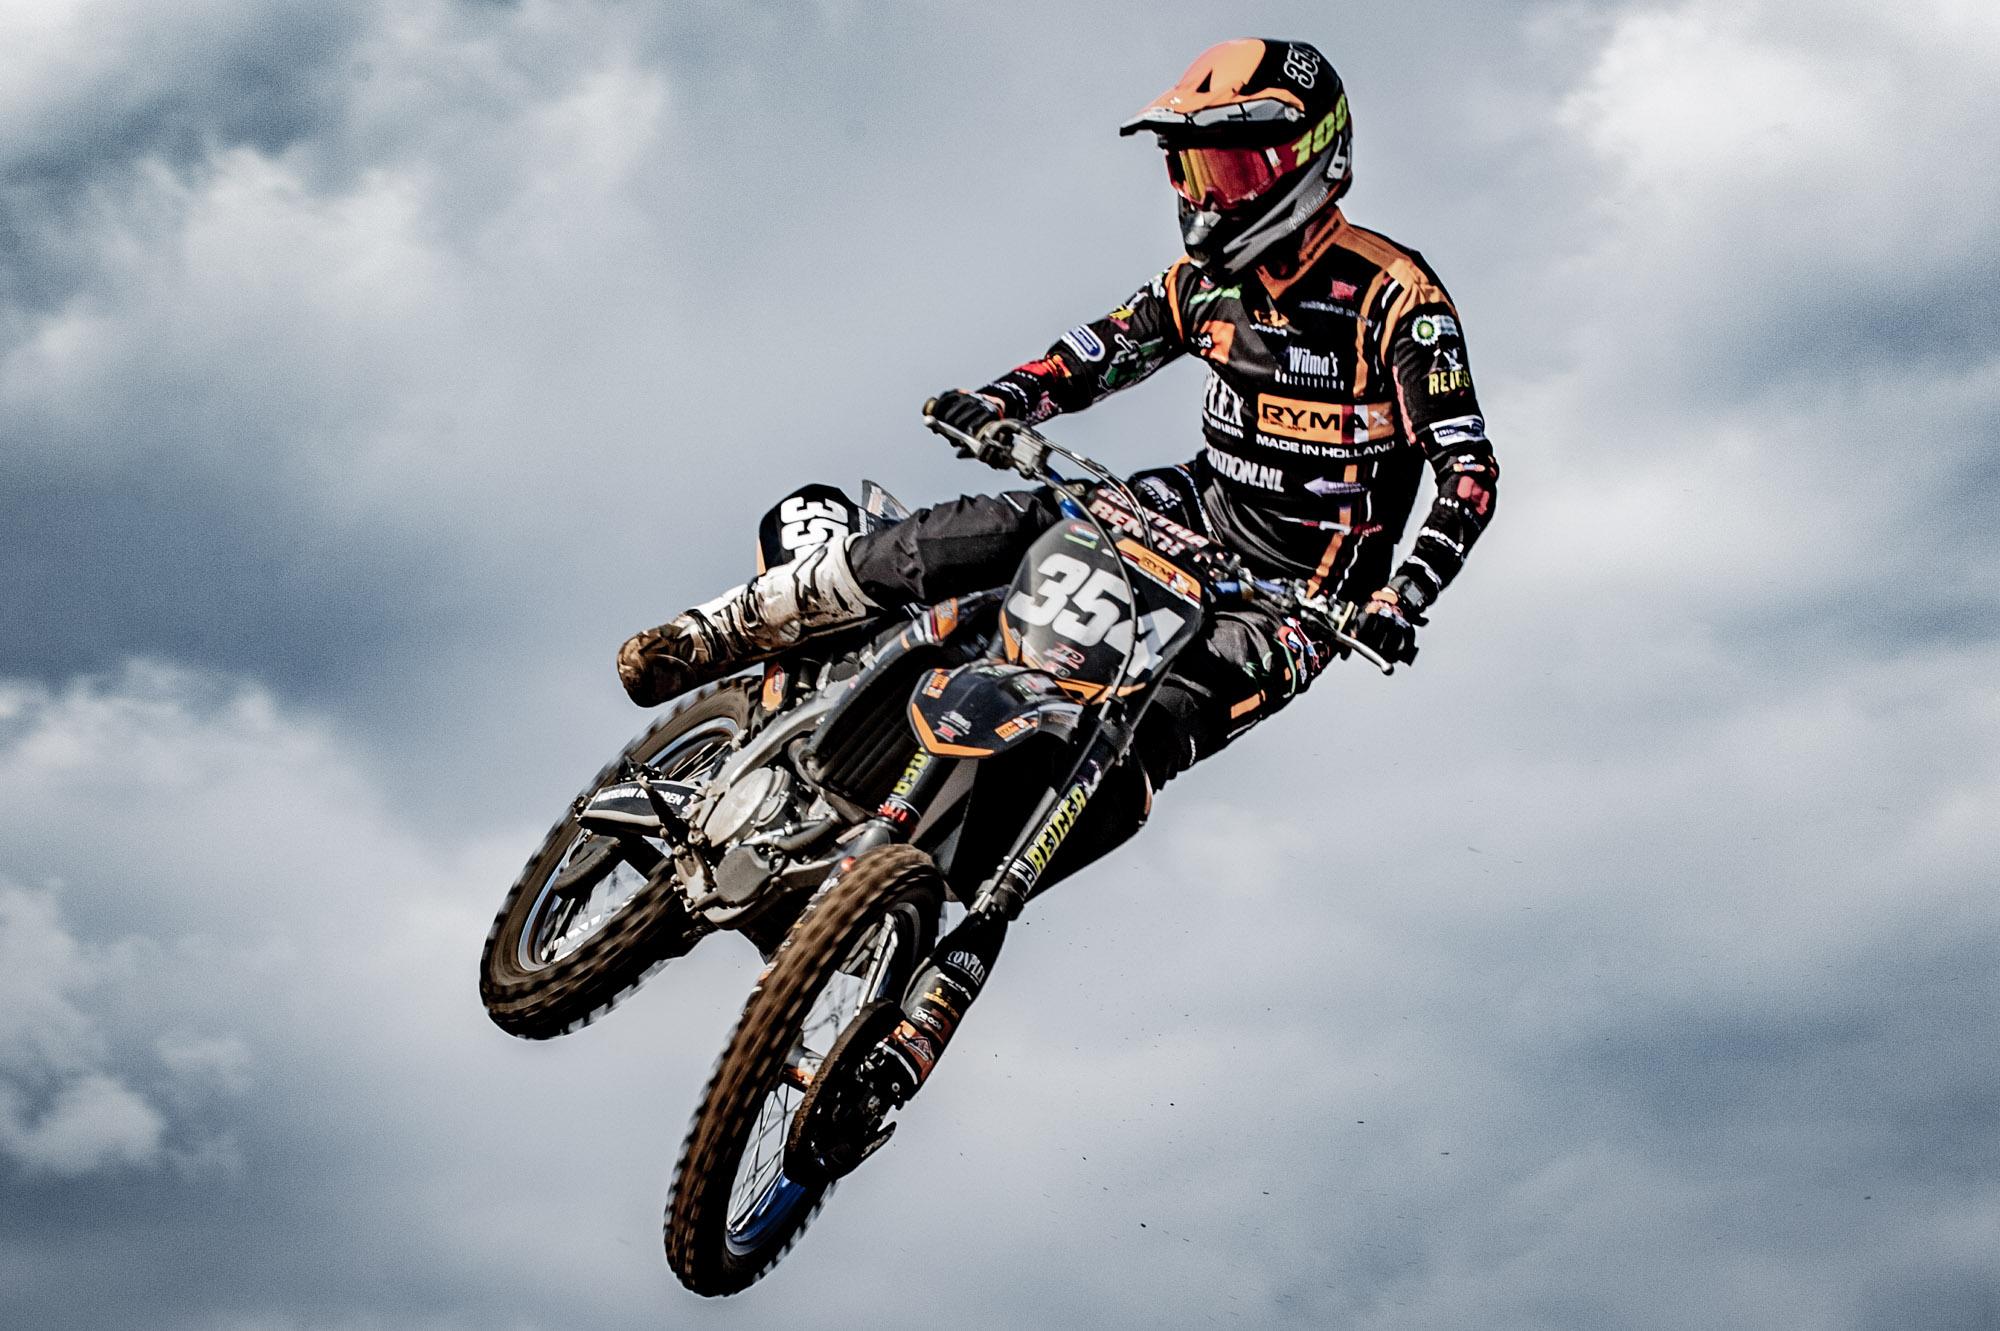 FOTOSHOOT MOTORCROSS RYMAX 2019-351